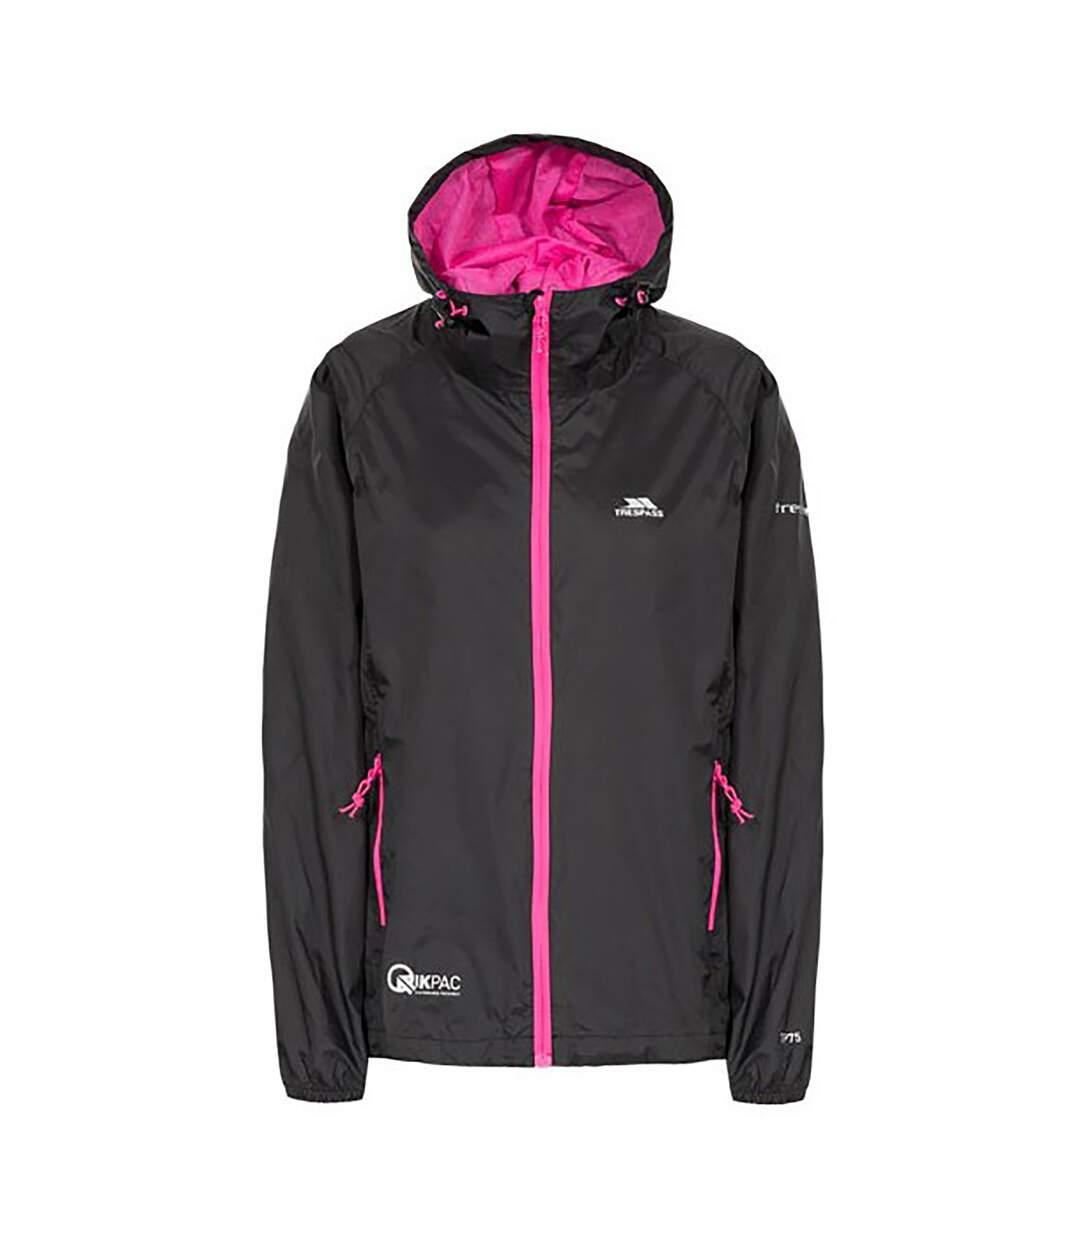 Trespass Womens/Ladies Qikpac Waterproof Packaway Shell Jacket (Navy) - UTTP3379